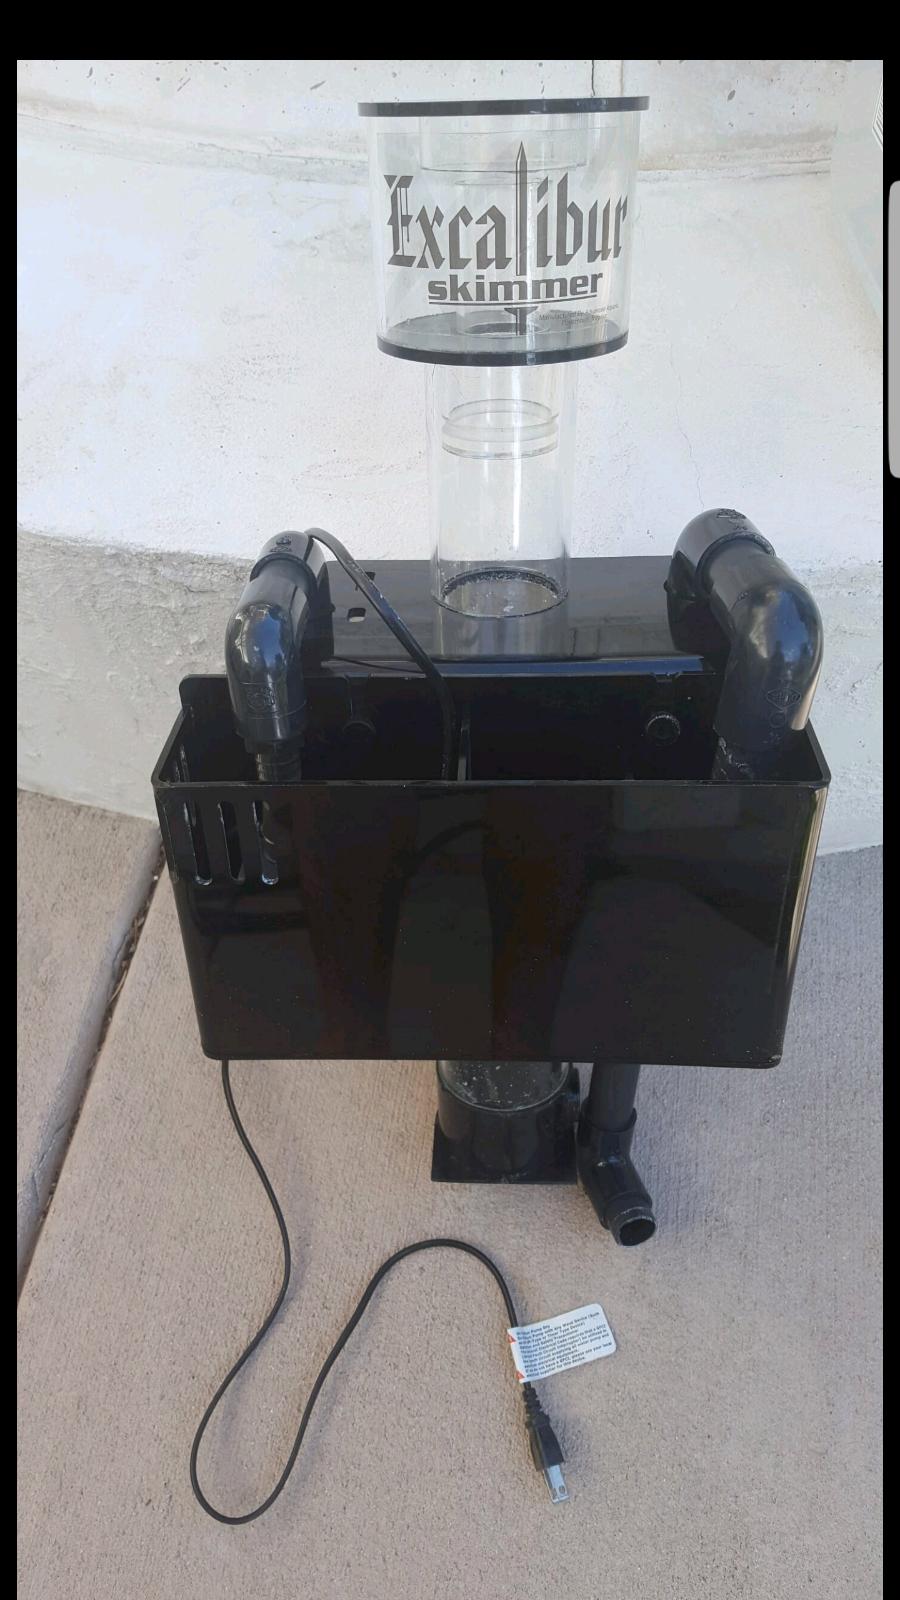 Excalibur Protein Skimmer Rio 800 pump Saltwater Acrylic Sump Filter Overflow